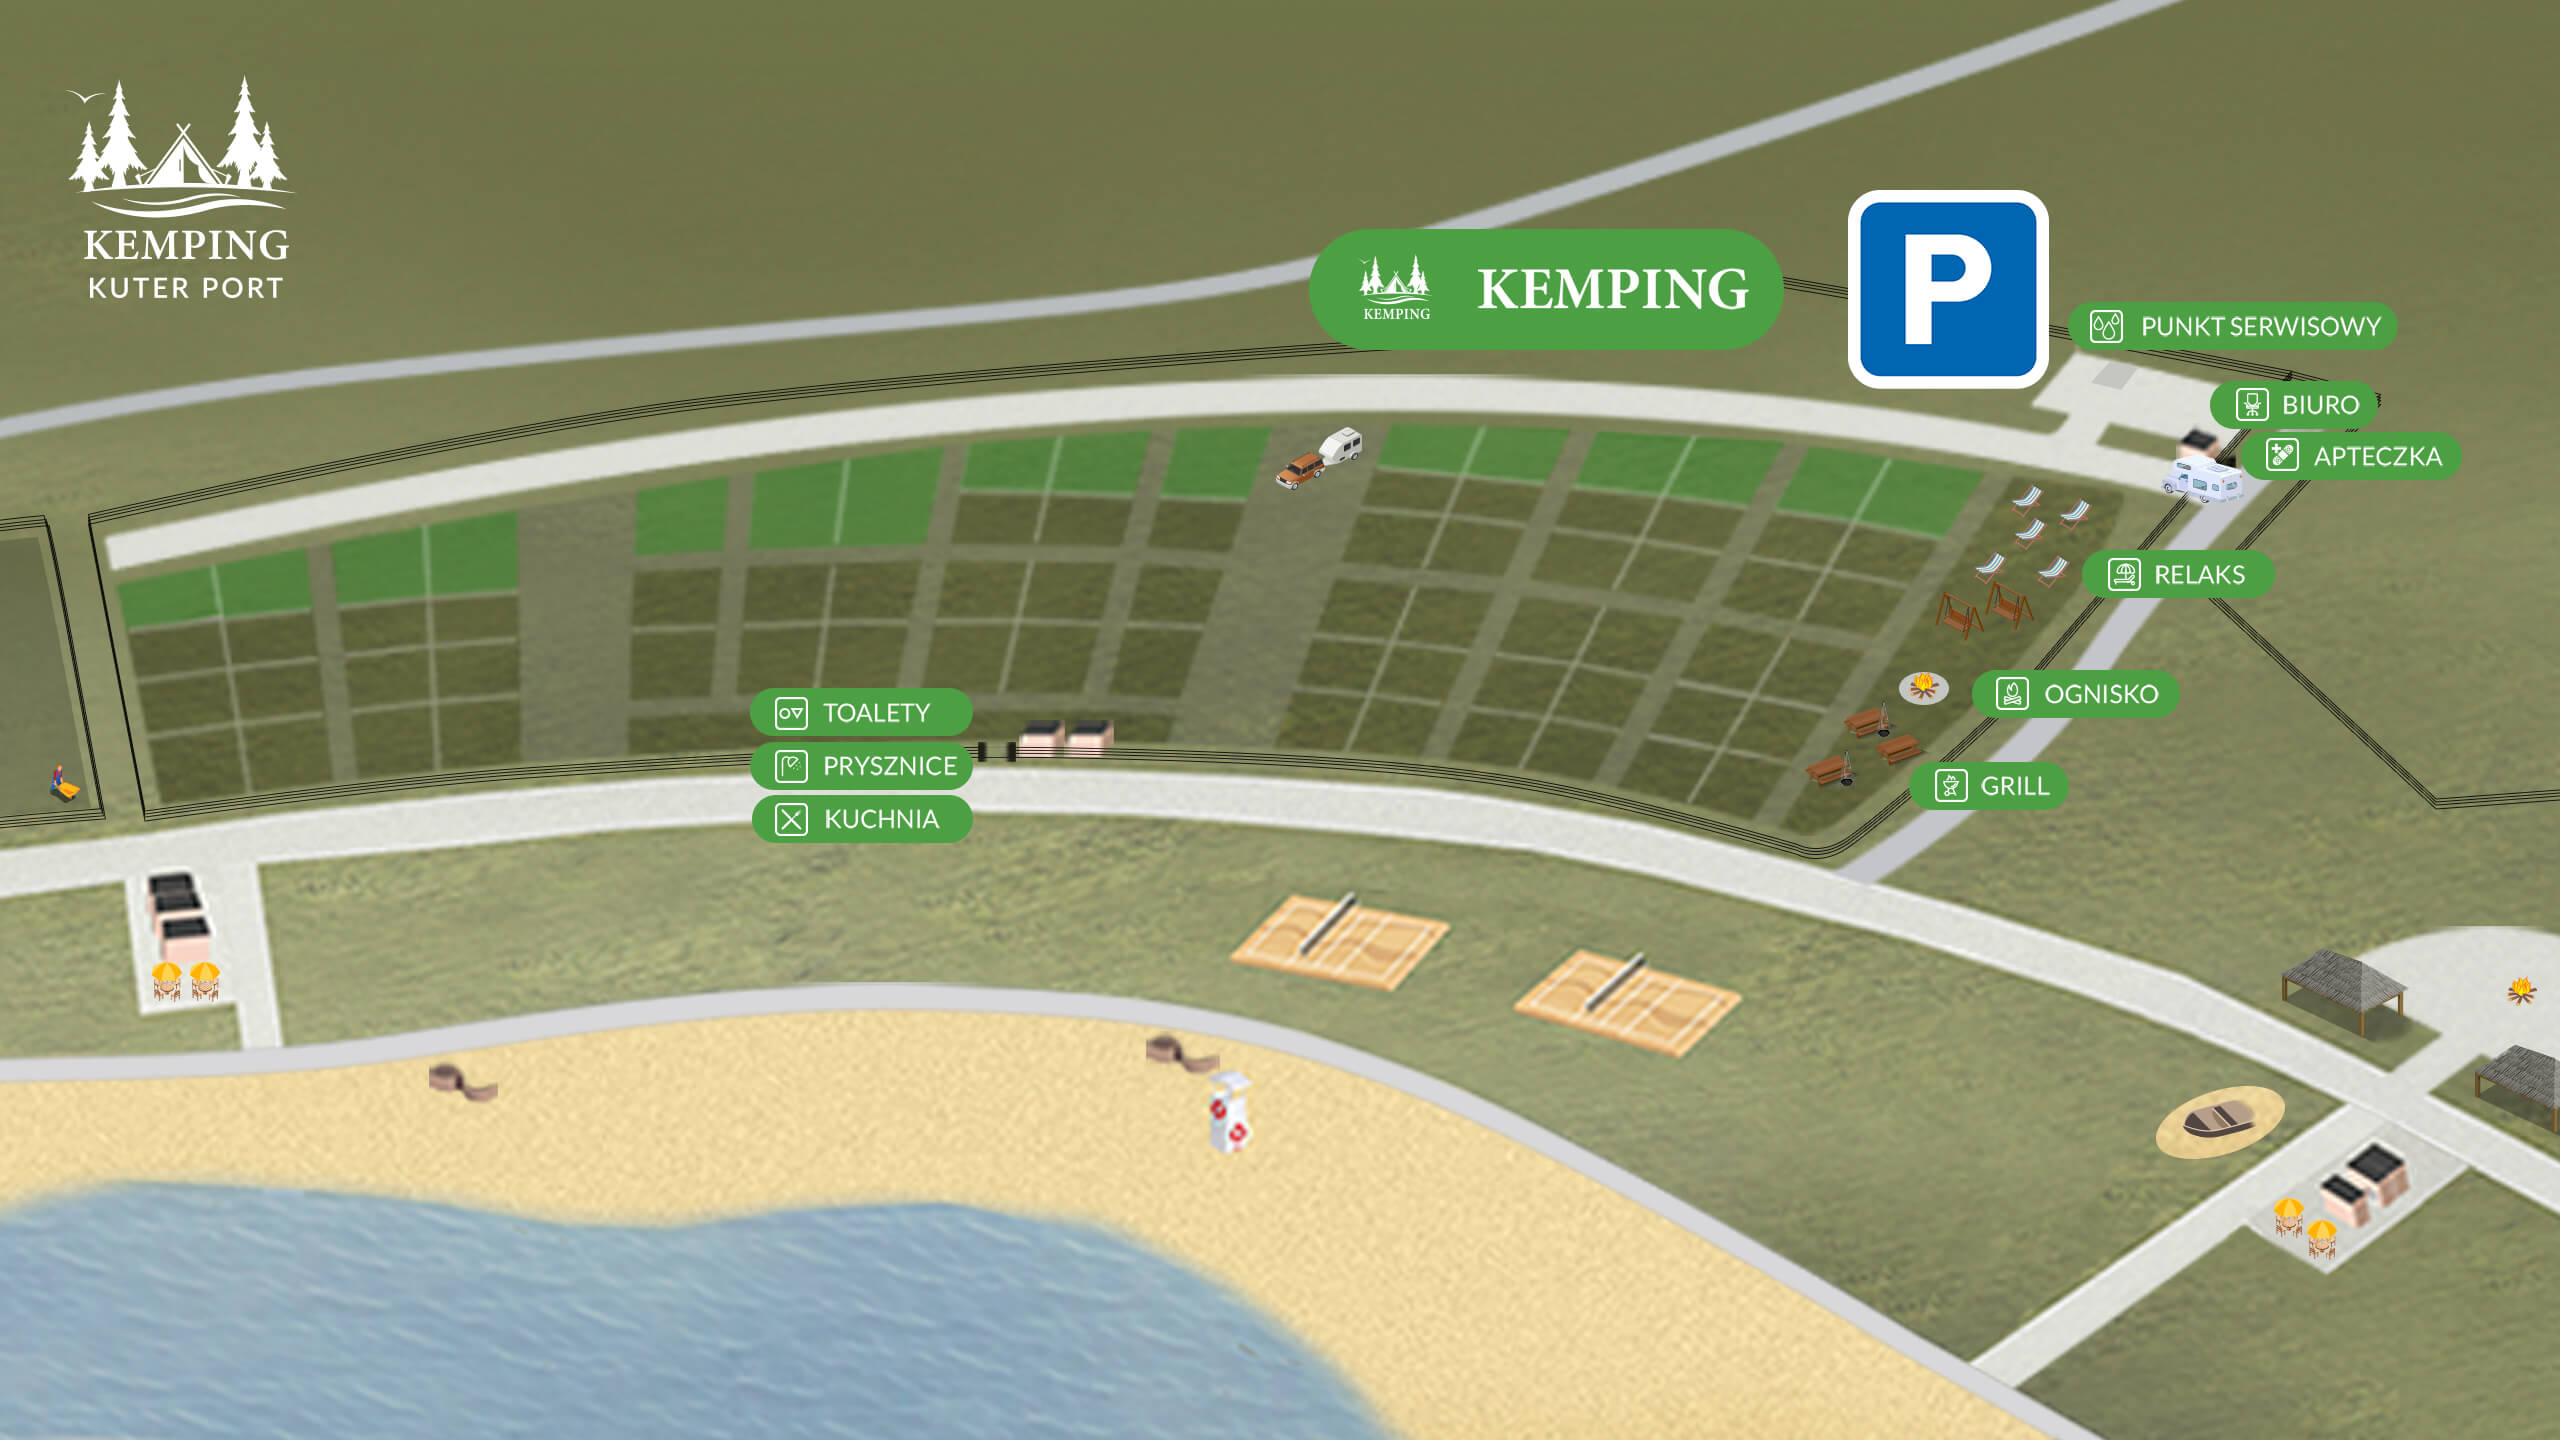 Plan Strefy Kemping